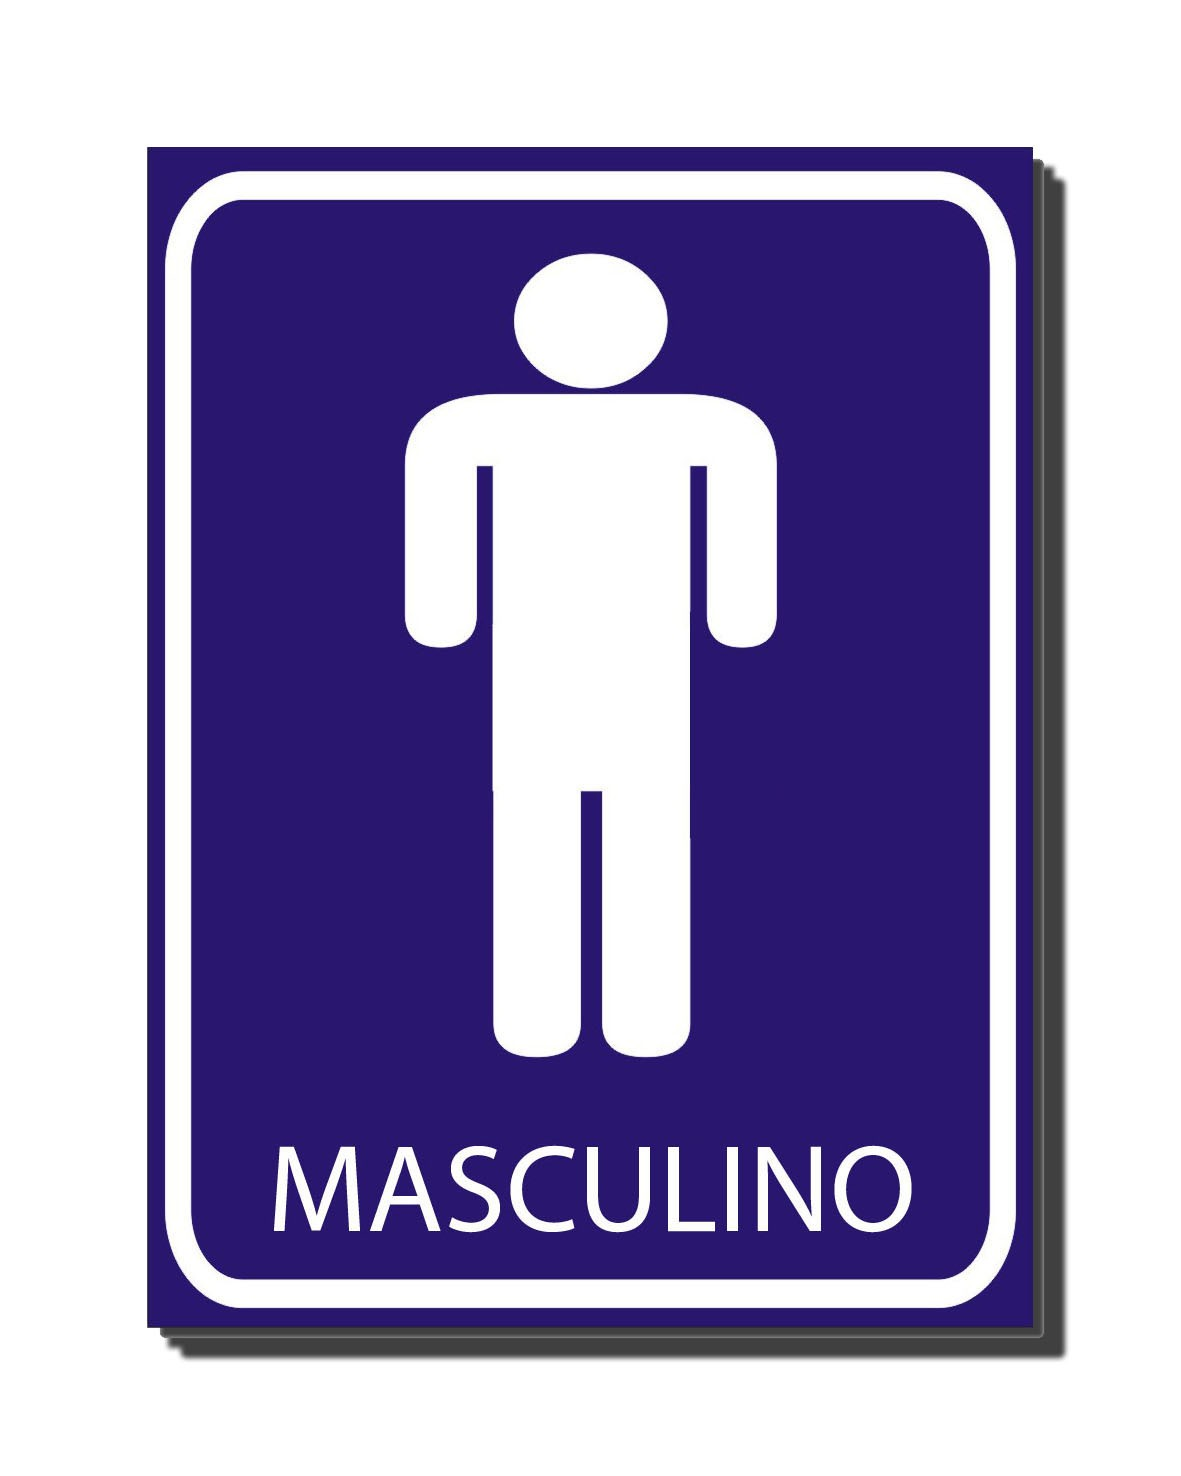 CONTA UMA Banheiro Masculino # Banheiro Feminino E Banheiro Masculino